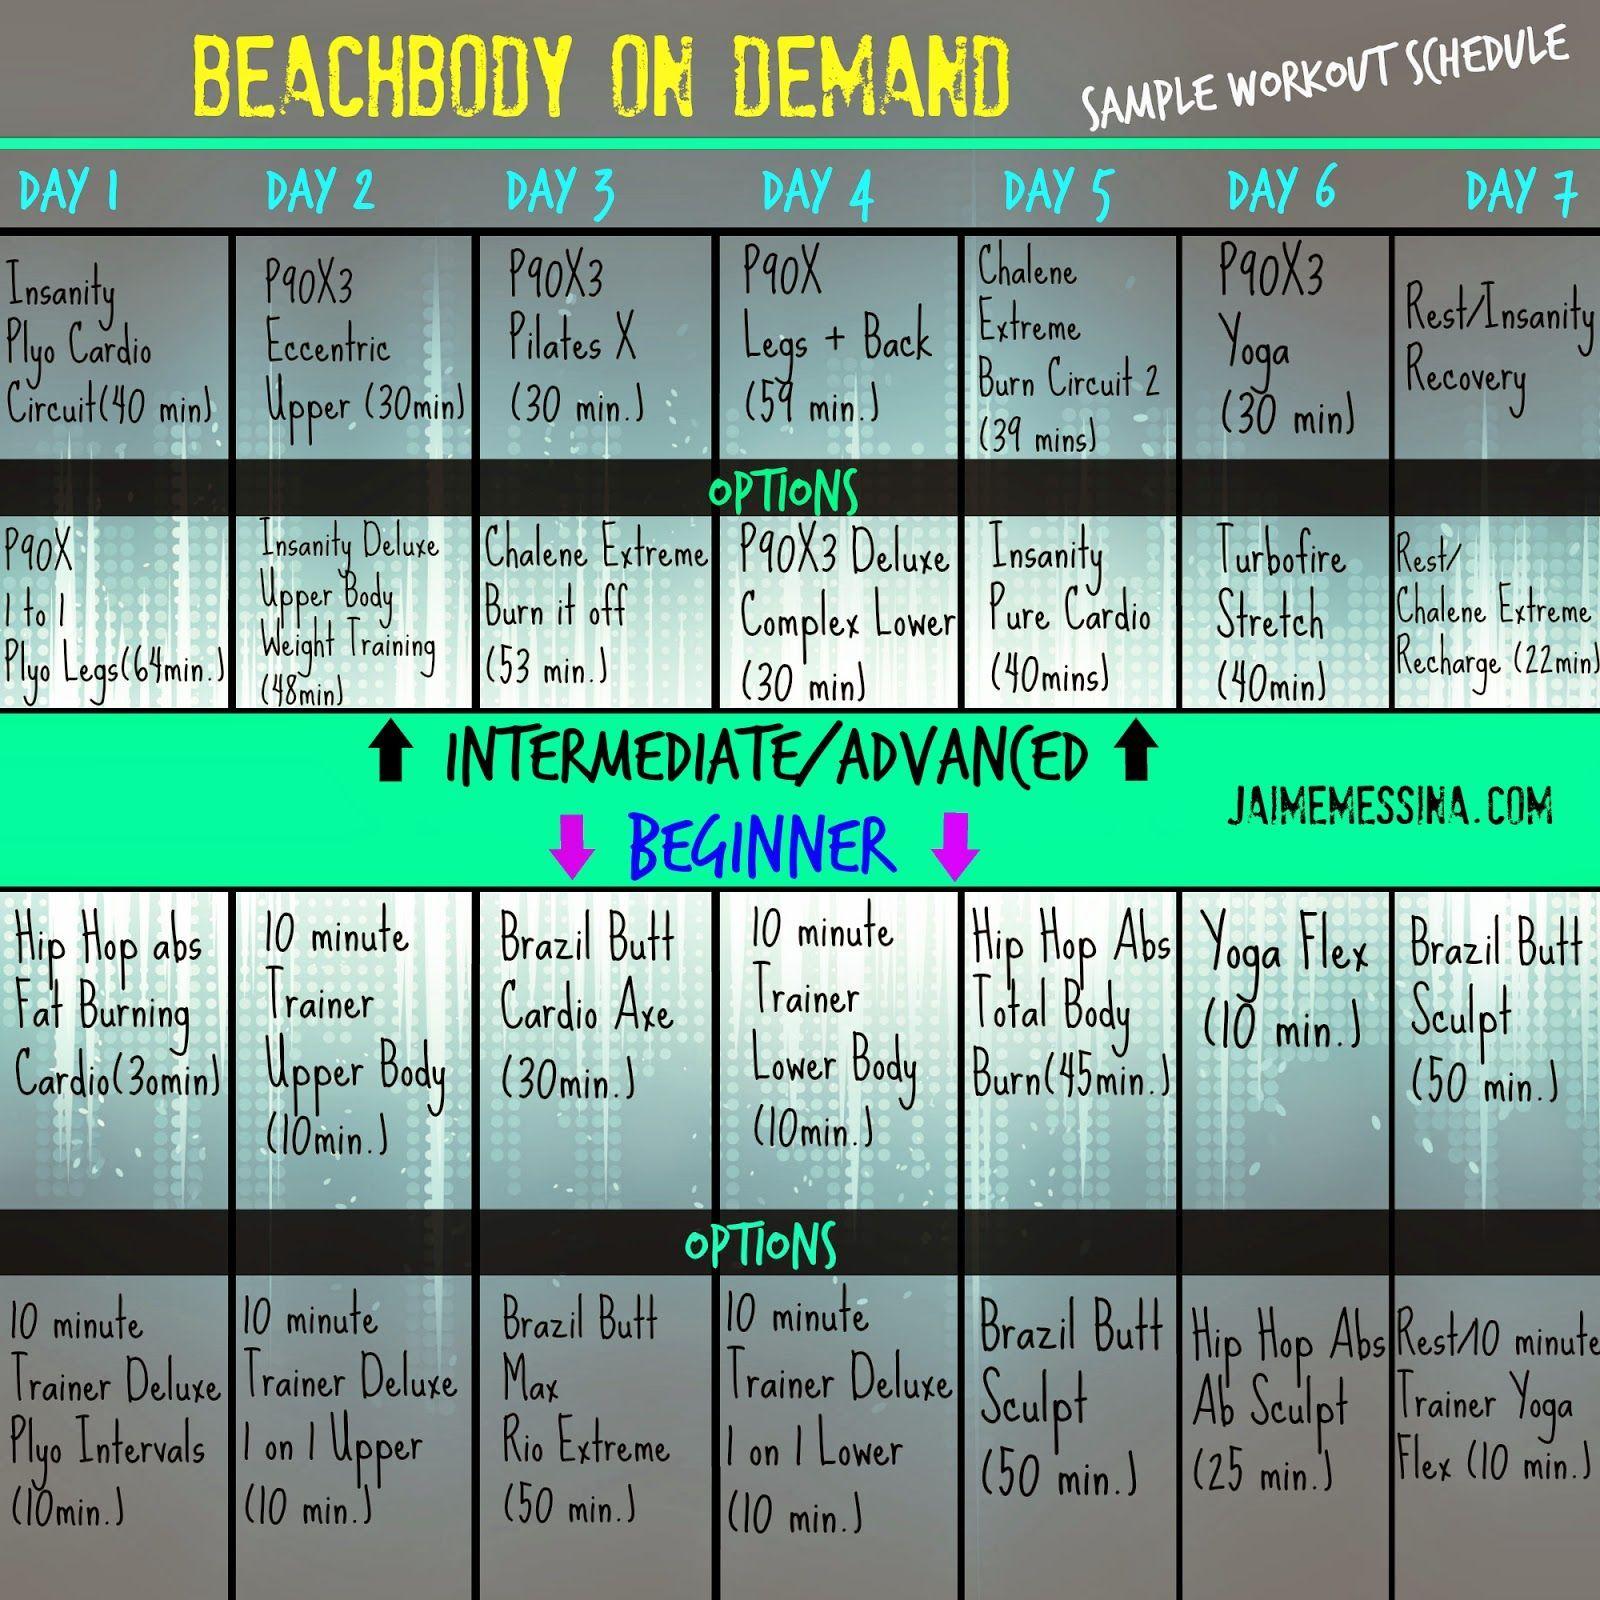 Bod Beachbody On Demand Free Workout Schedule Workout